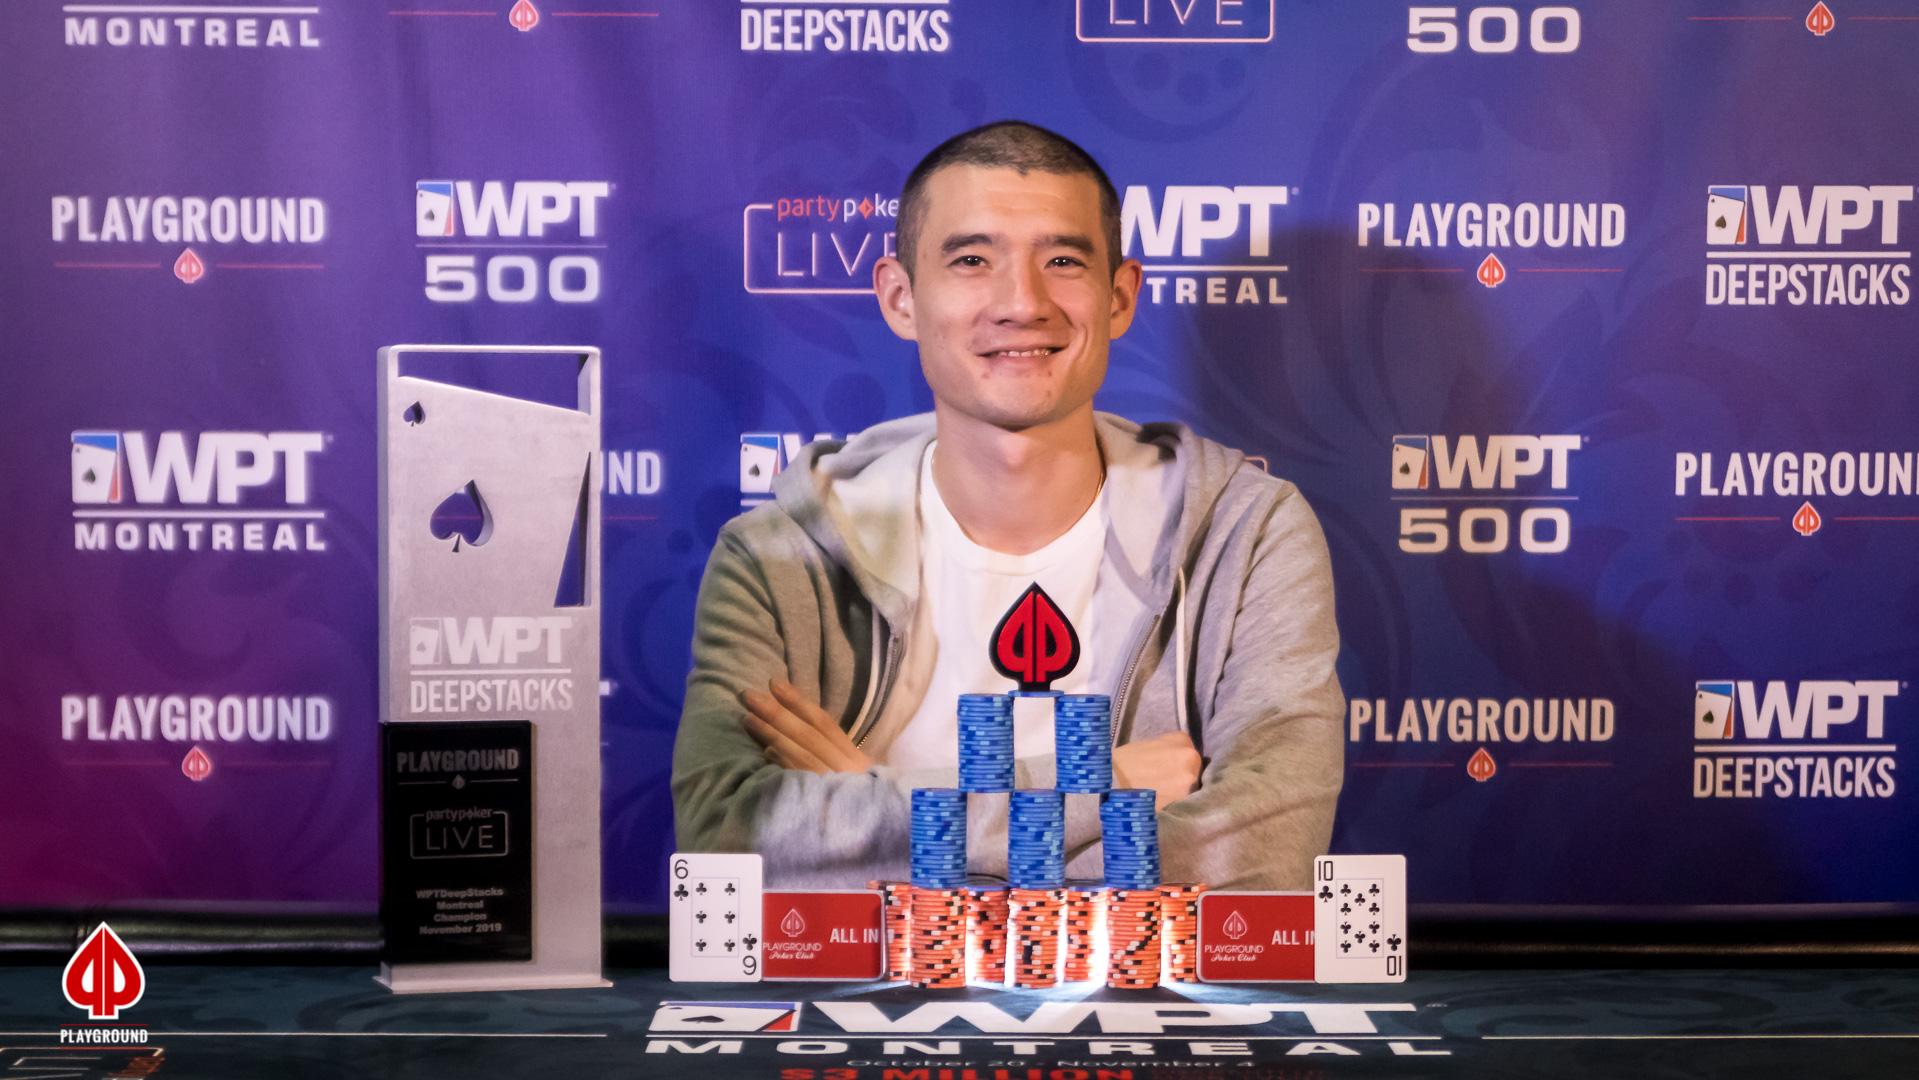 WPTDeepstacks Champion: Jack Salter, $151,220